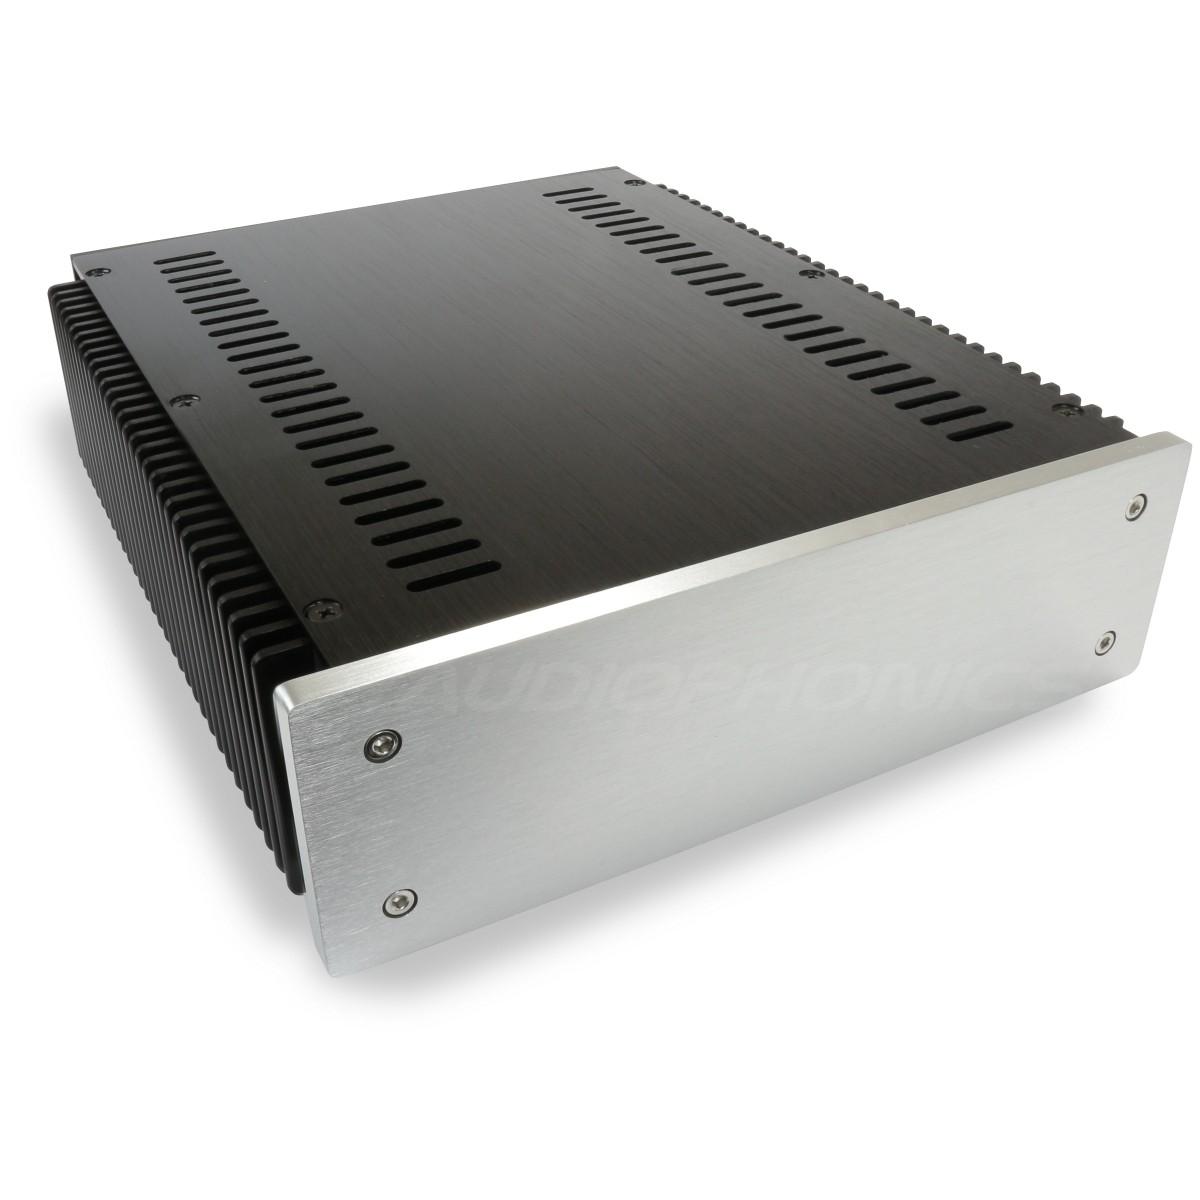 DIY Box / Case 100% Aluminium with heatsink 271x226x70mm